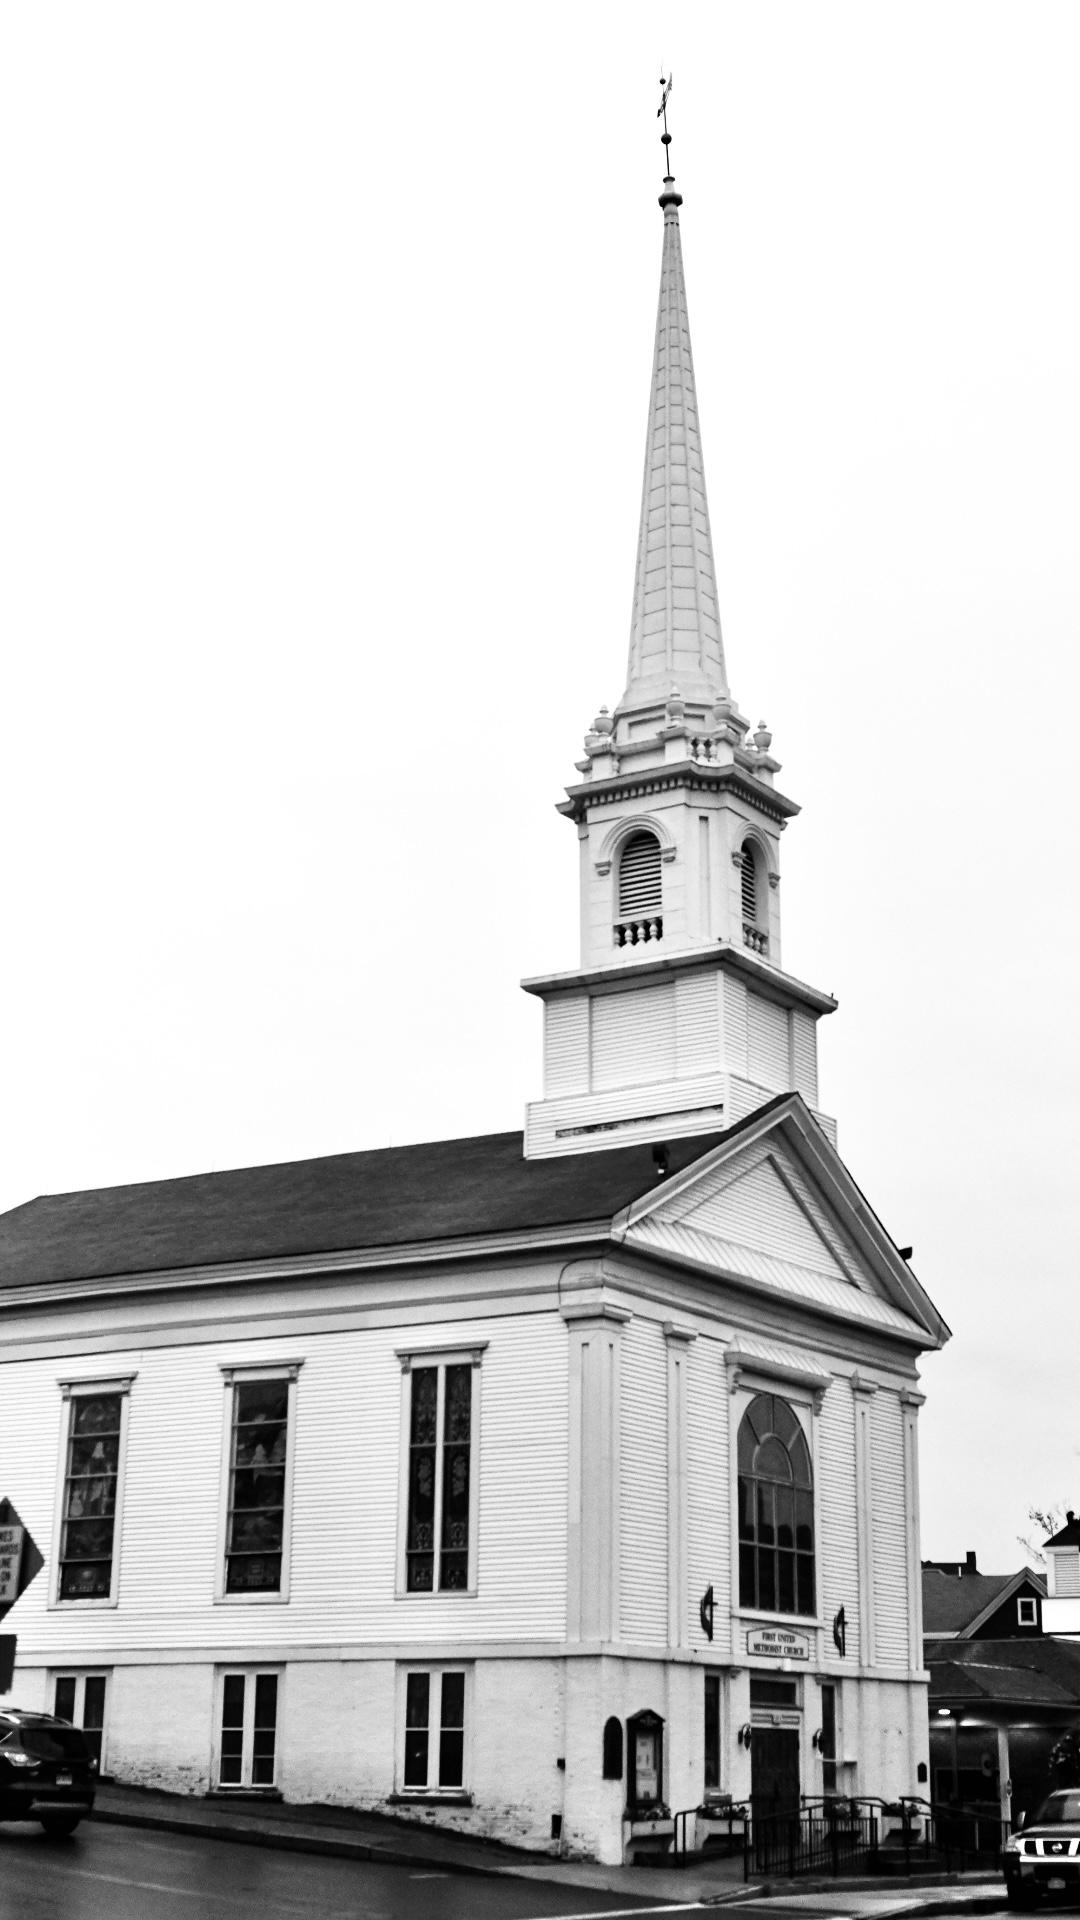 2021. Taryn Okesson. Digital Photography. Littleton, New Hampshire.